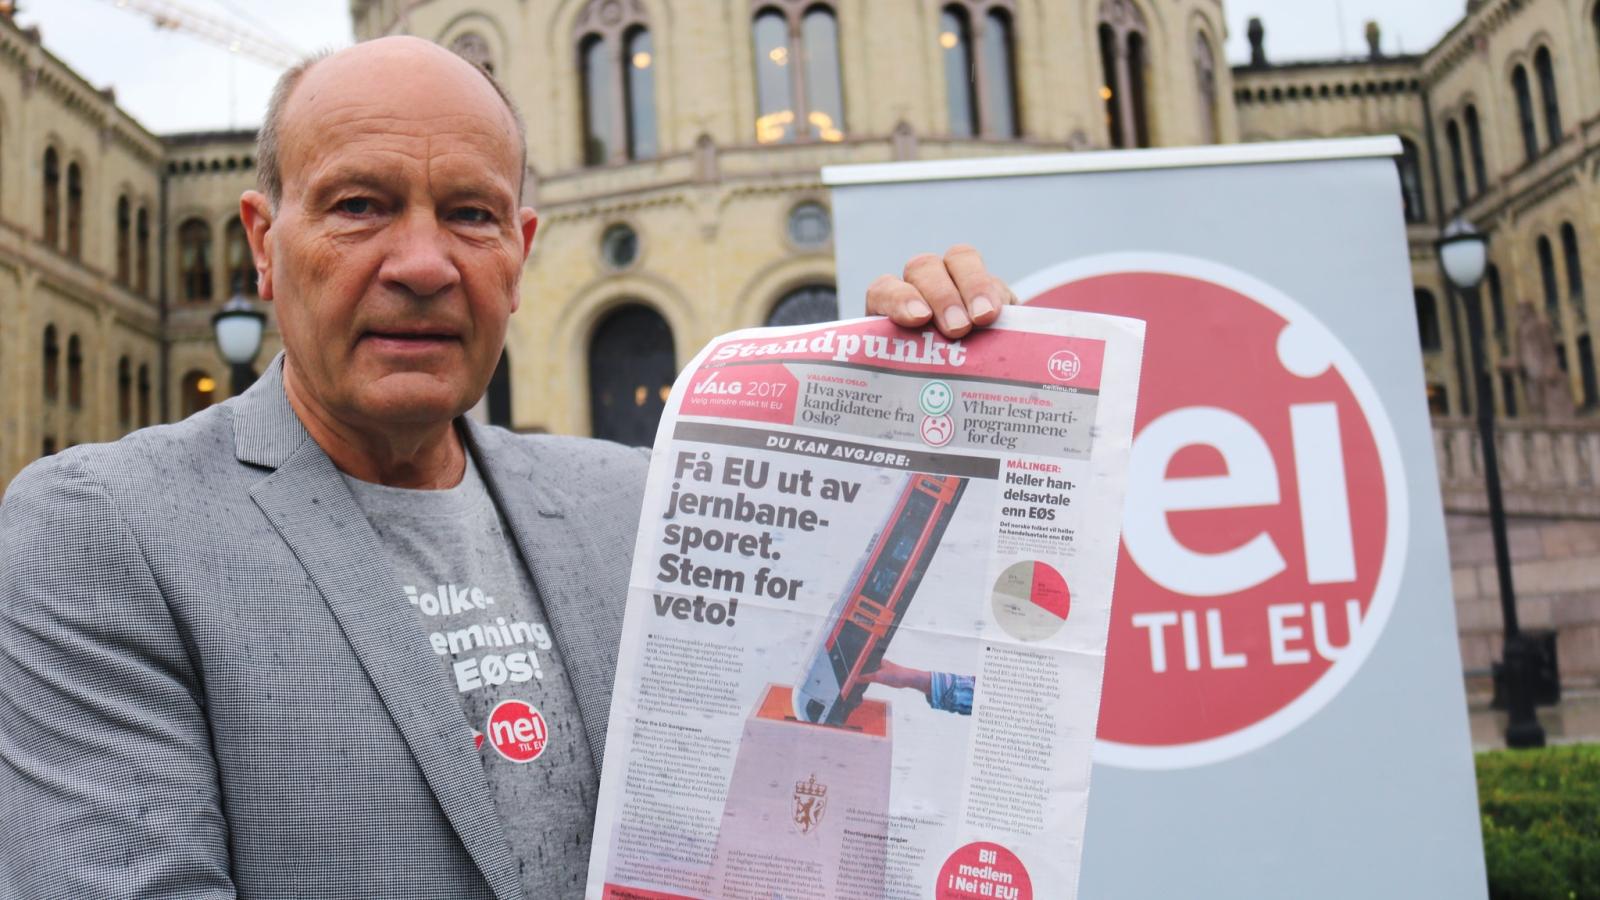 Olaf Gjedrem foran Stortinget. Bildet er fra 2017.